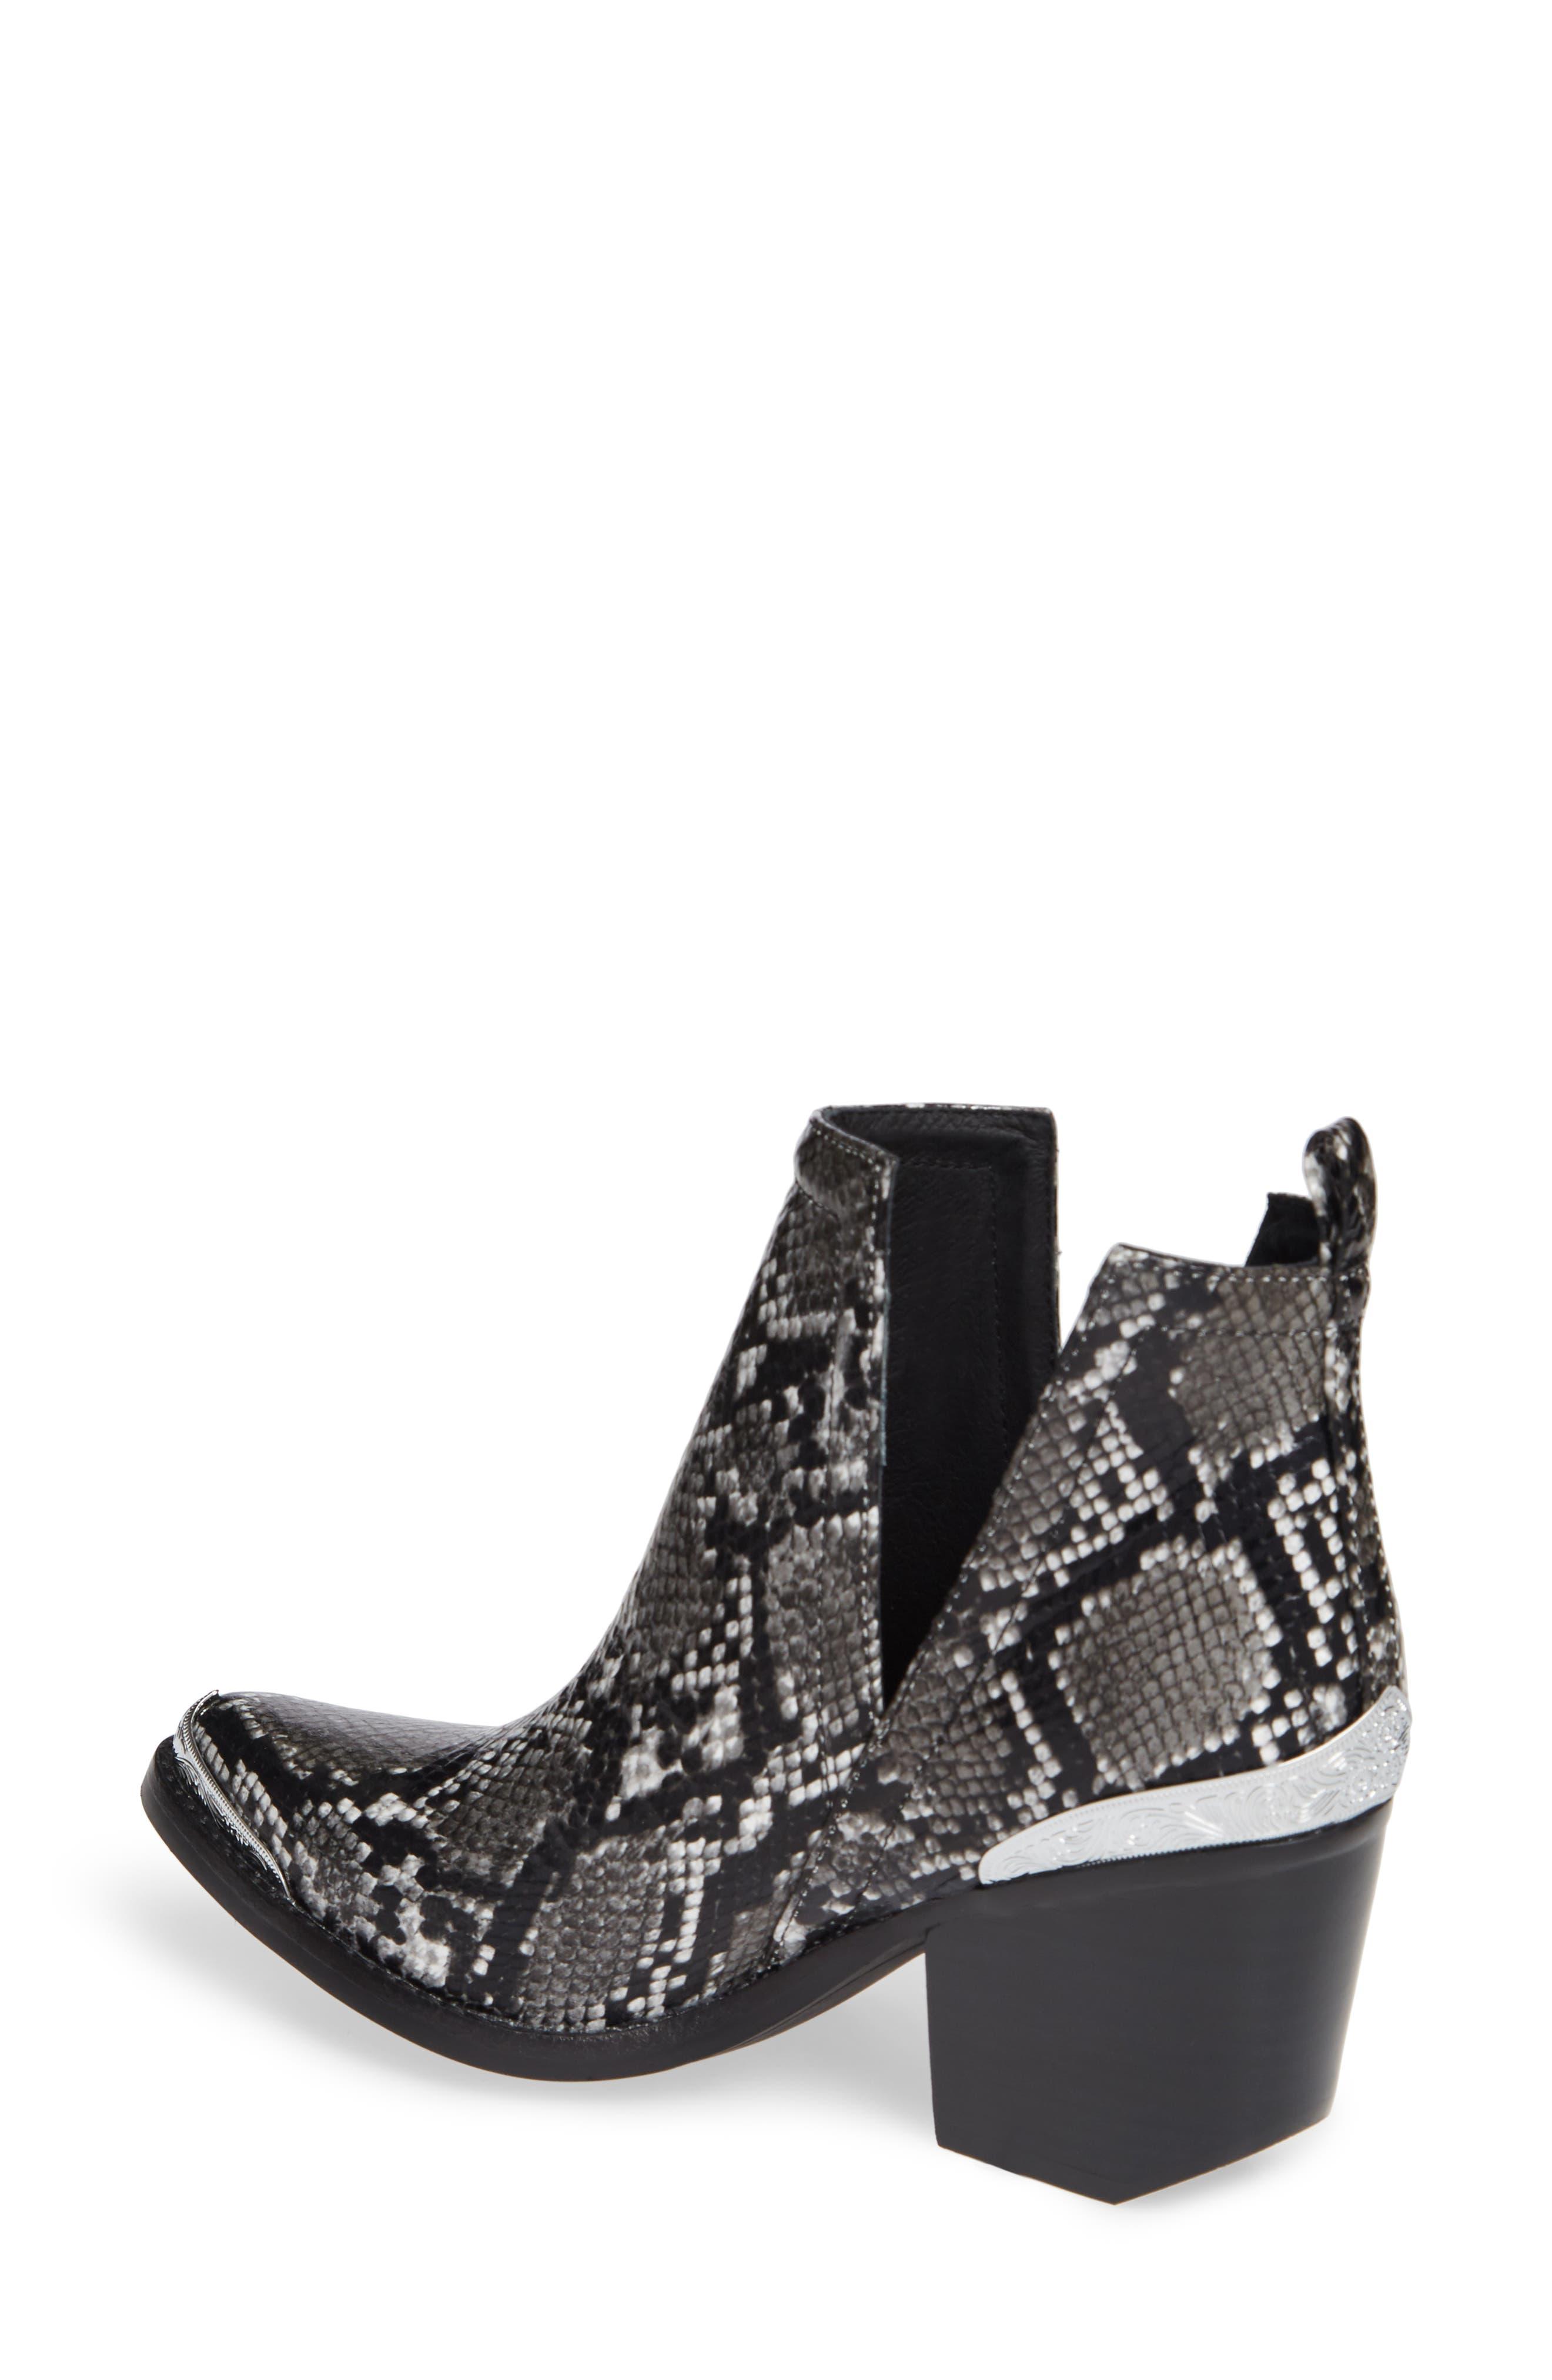 56644e324f3 Women's Jeffrey Campbell Shoes | Nordstrom